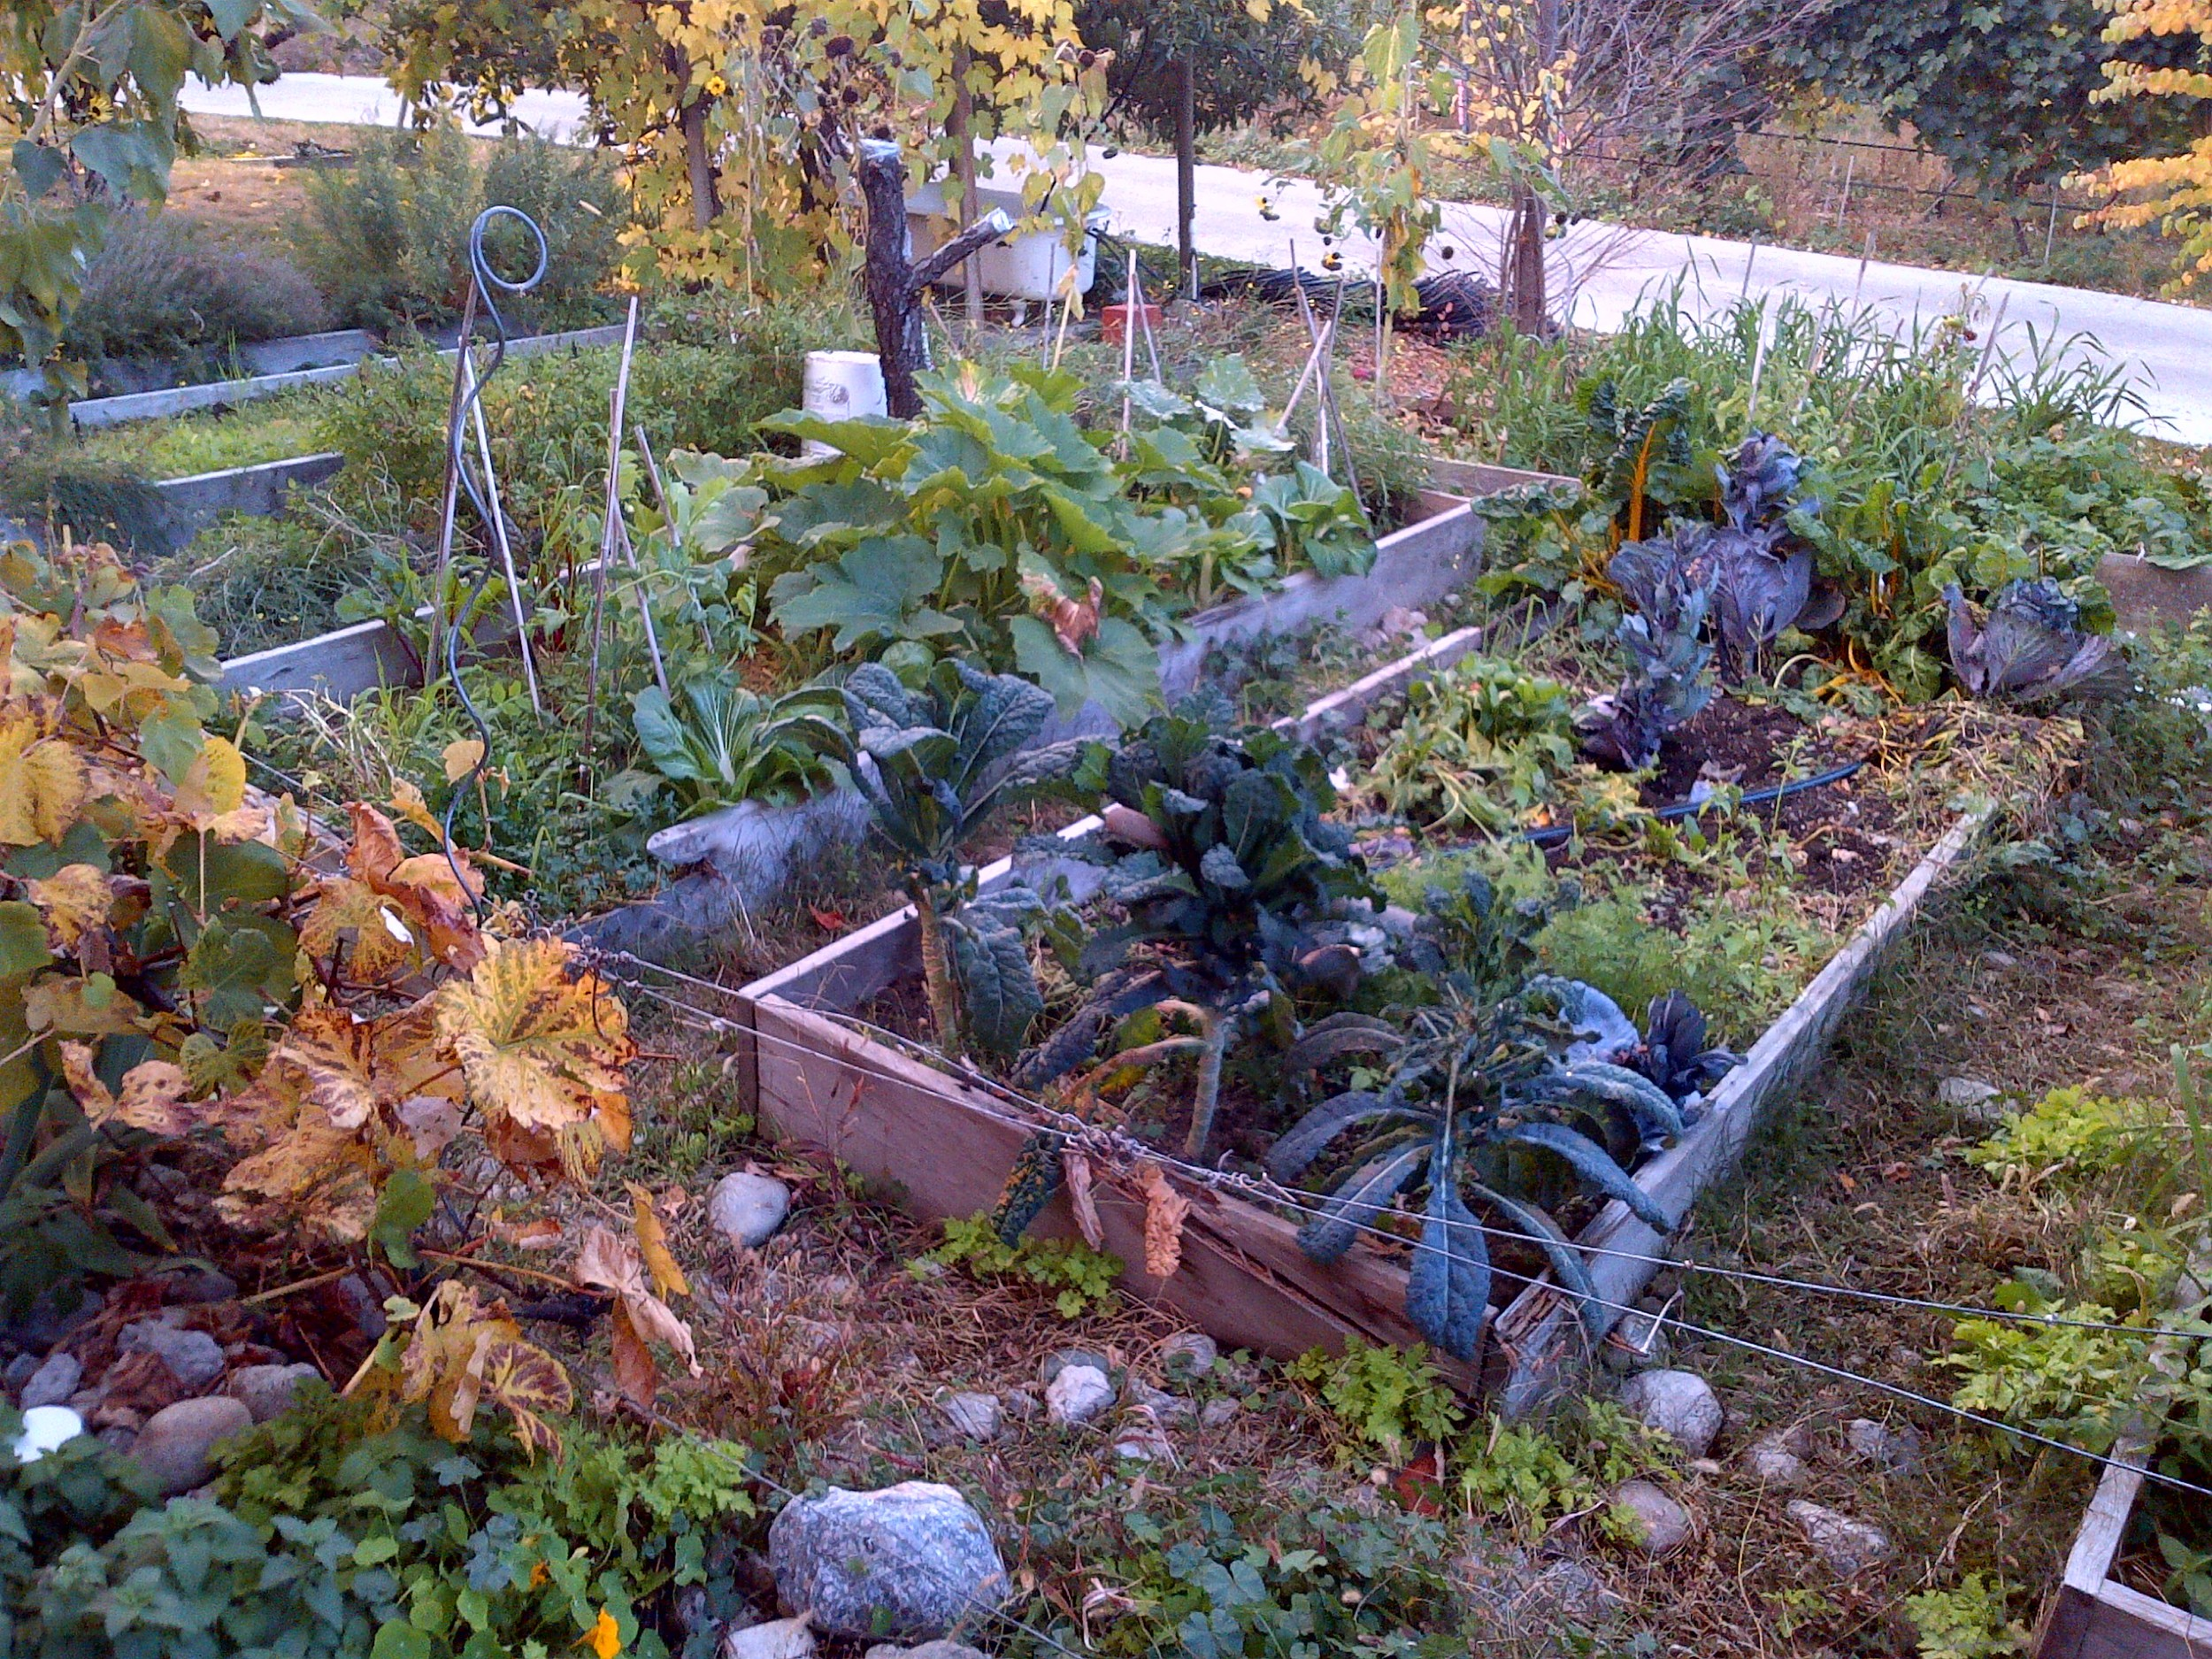 Heidi's vegetable garden